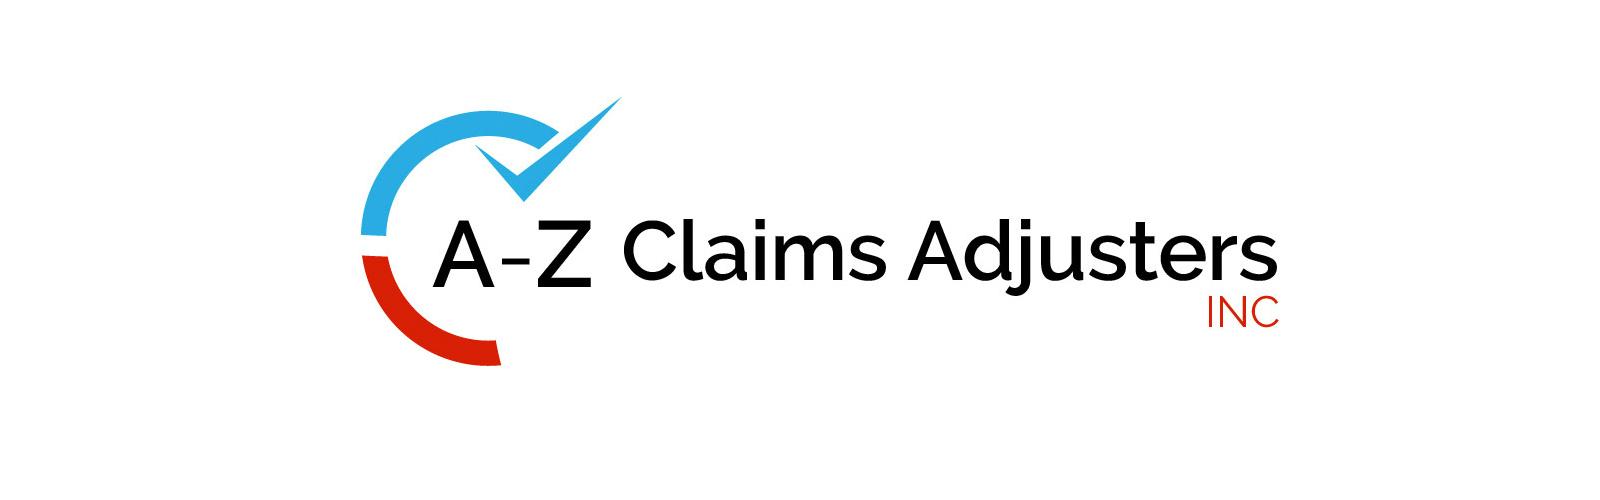 A-Z Claims Adjusters INC Logo 1600x500 JPEG.jpg